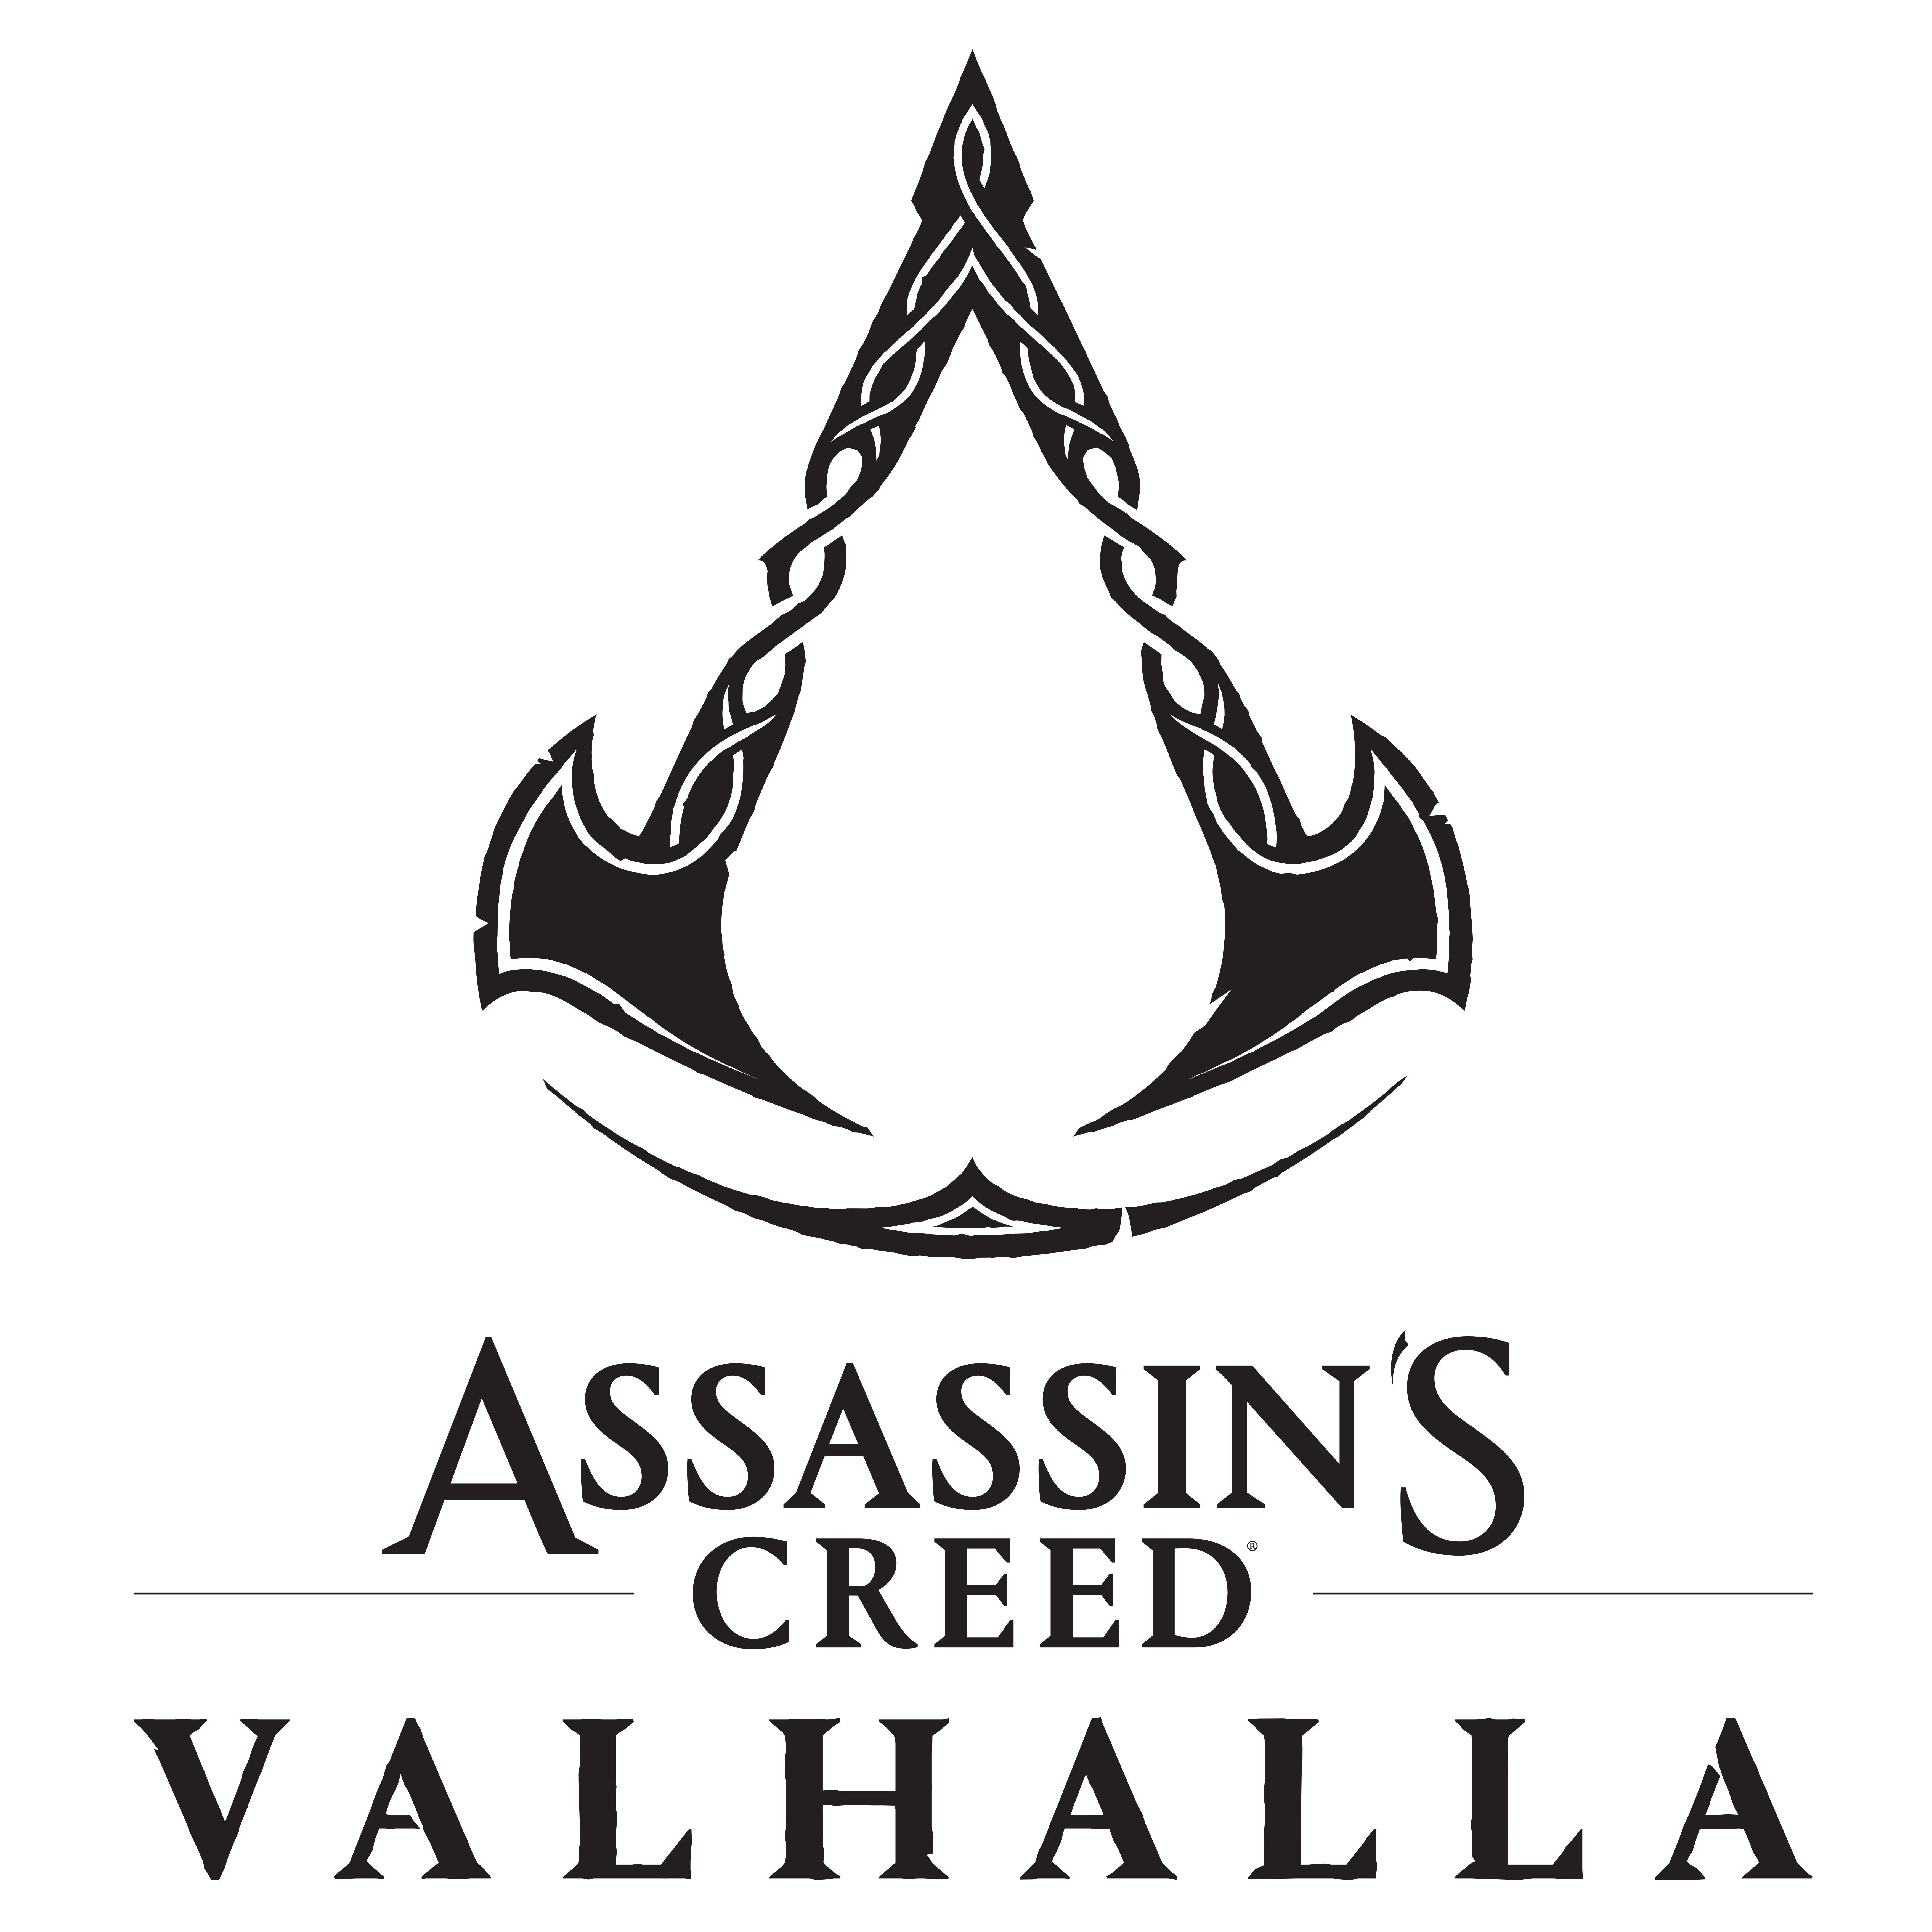 Look Logo: Assassin's Creed Valhalla